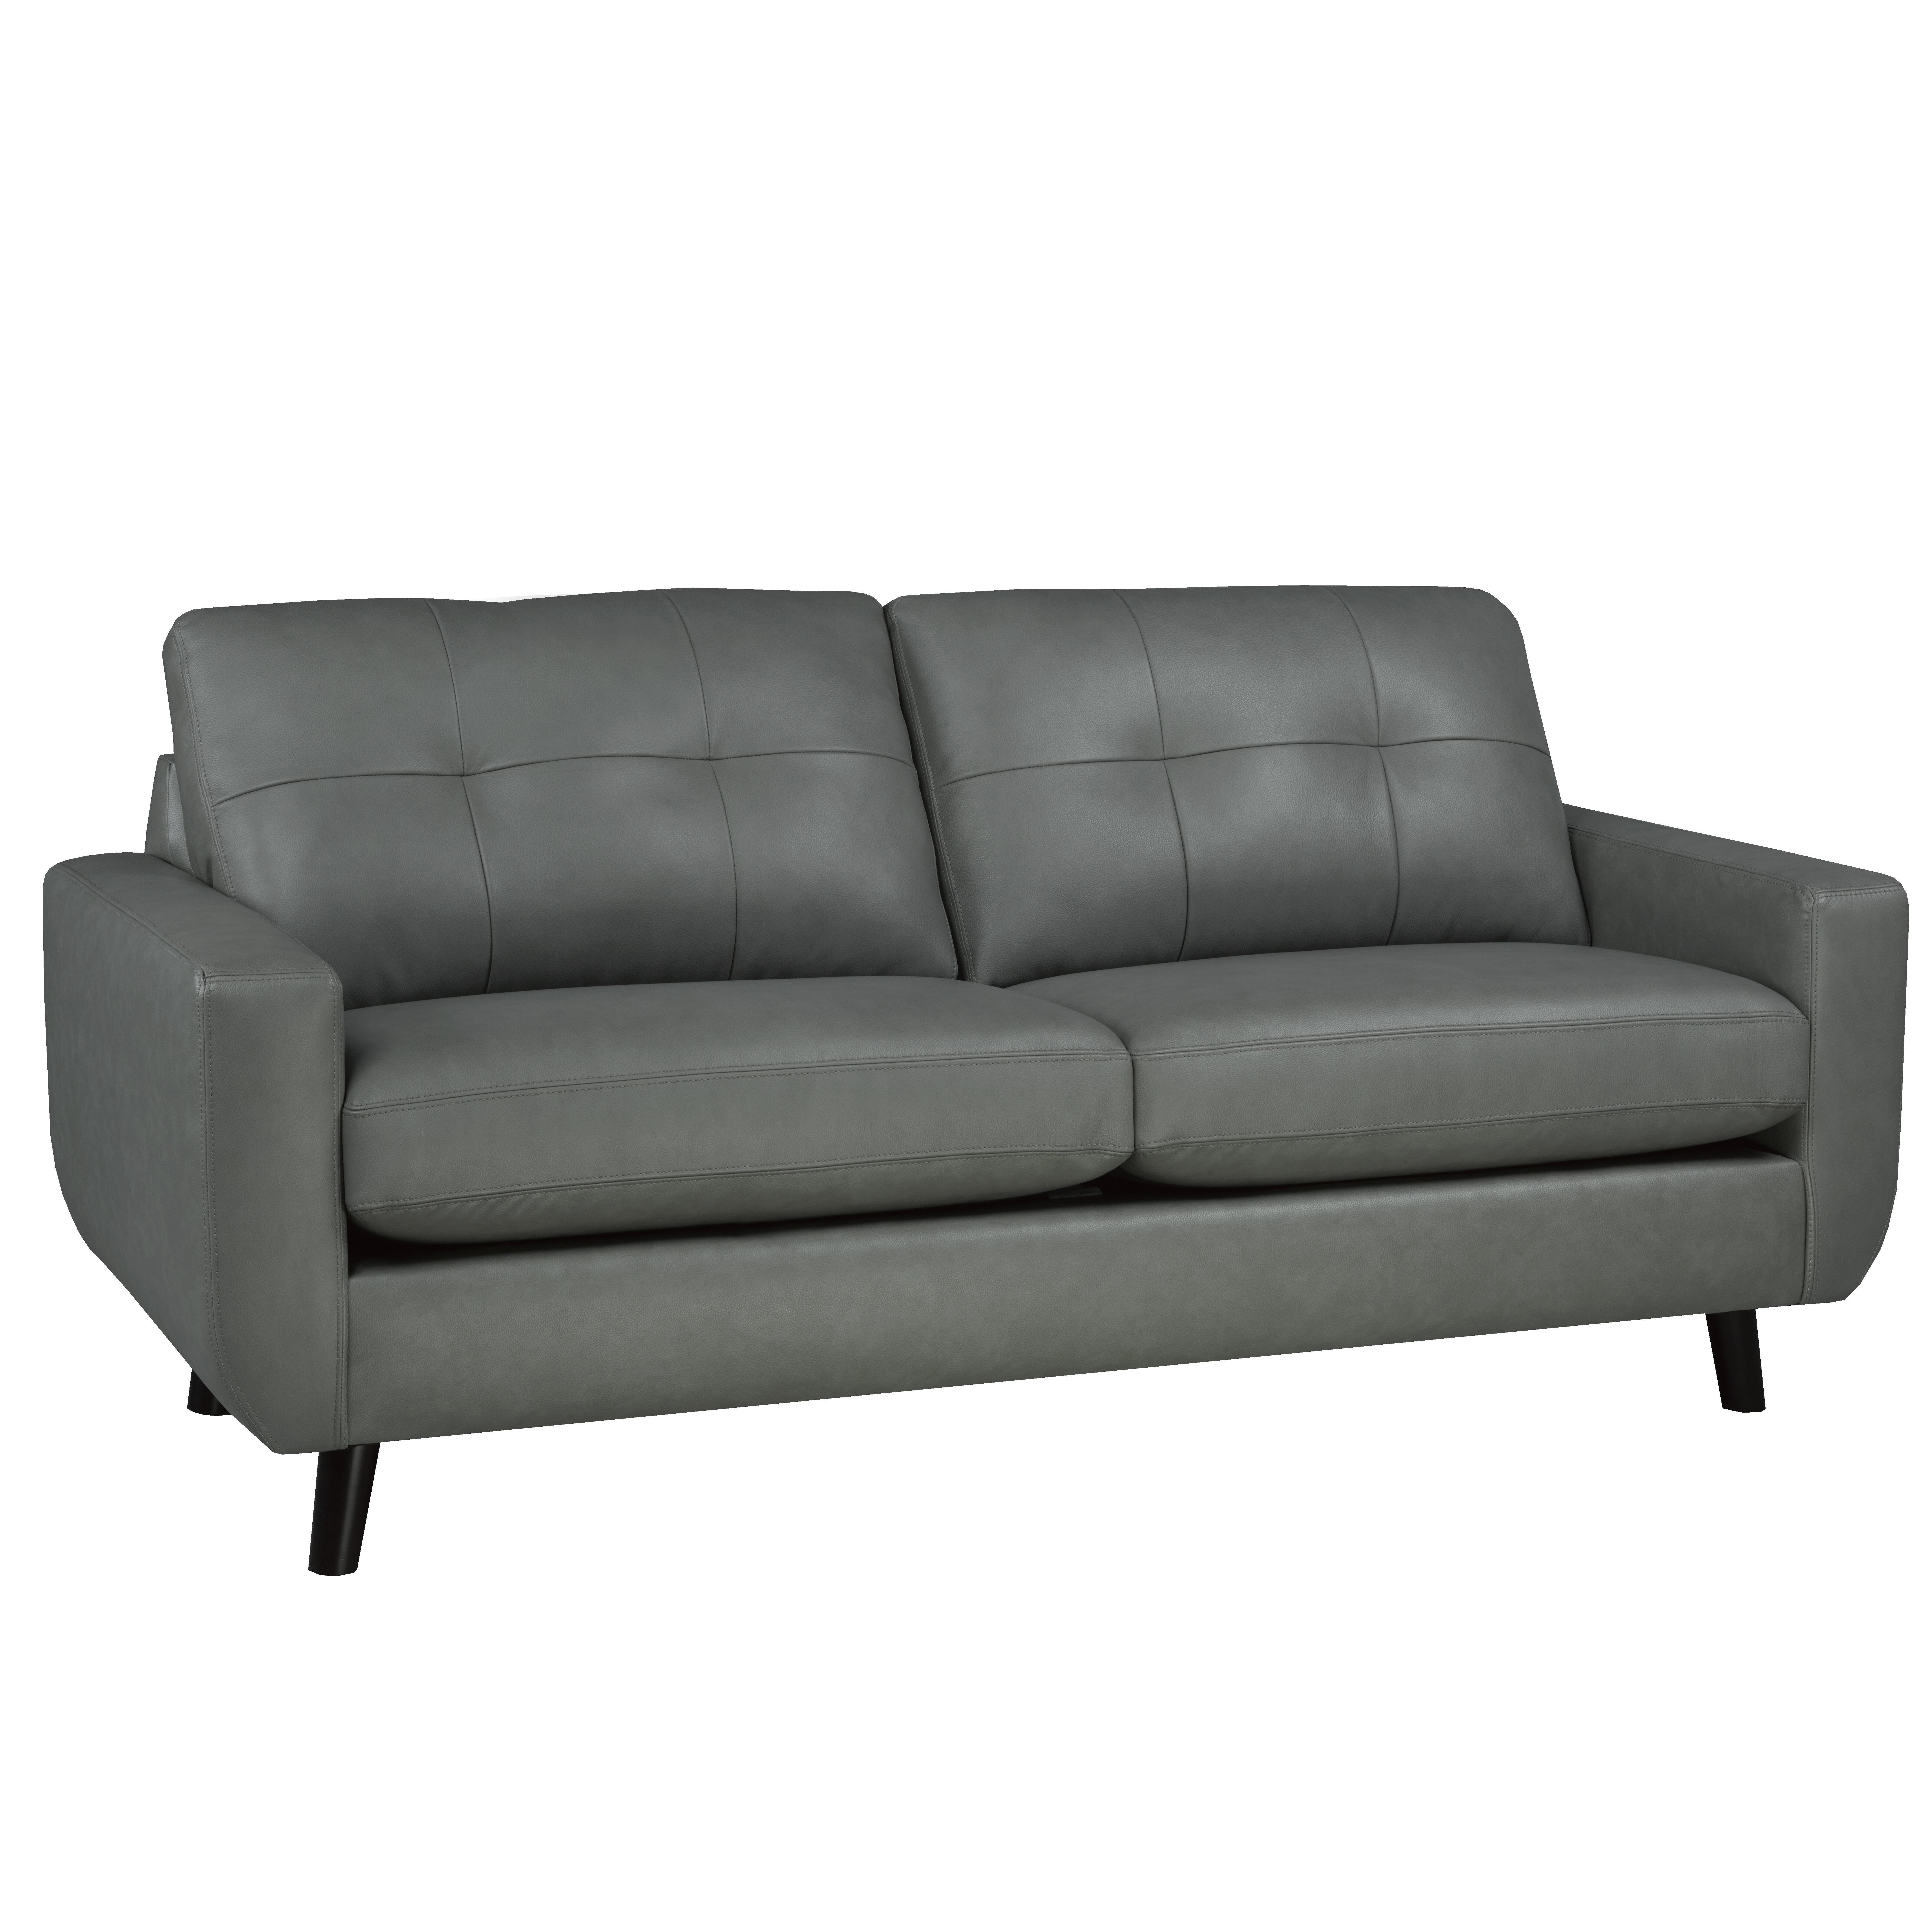 Brayden Studio Lathrop Genuine Leather Sofa   Wayfair